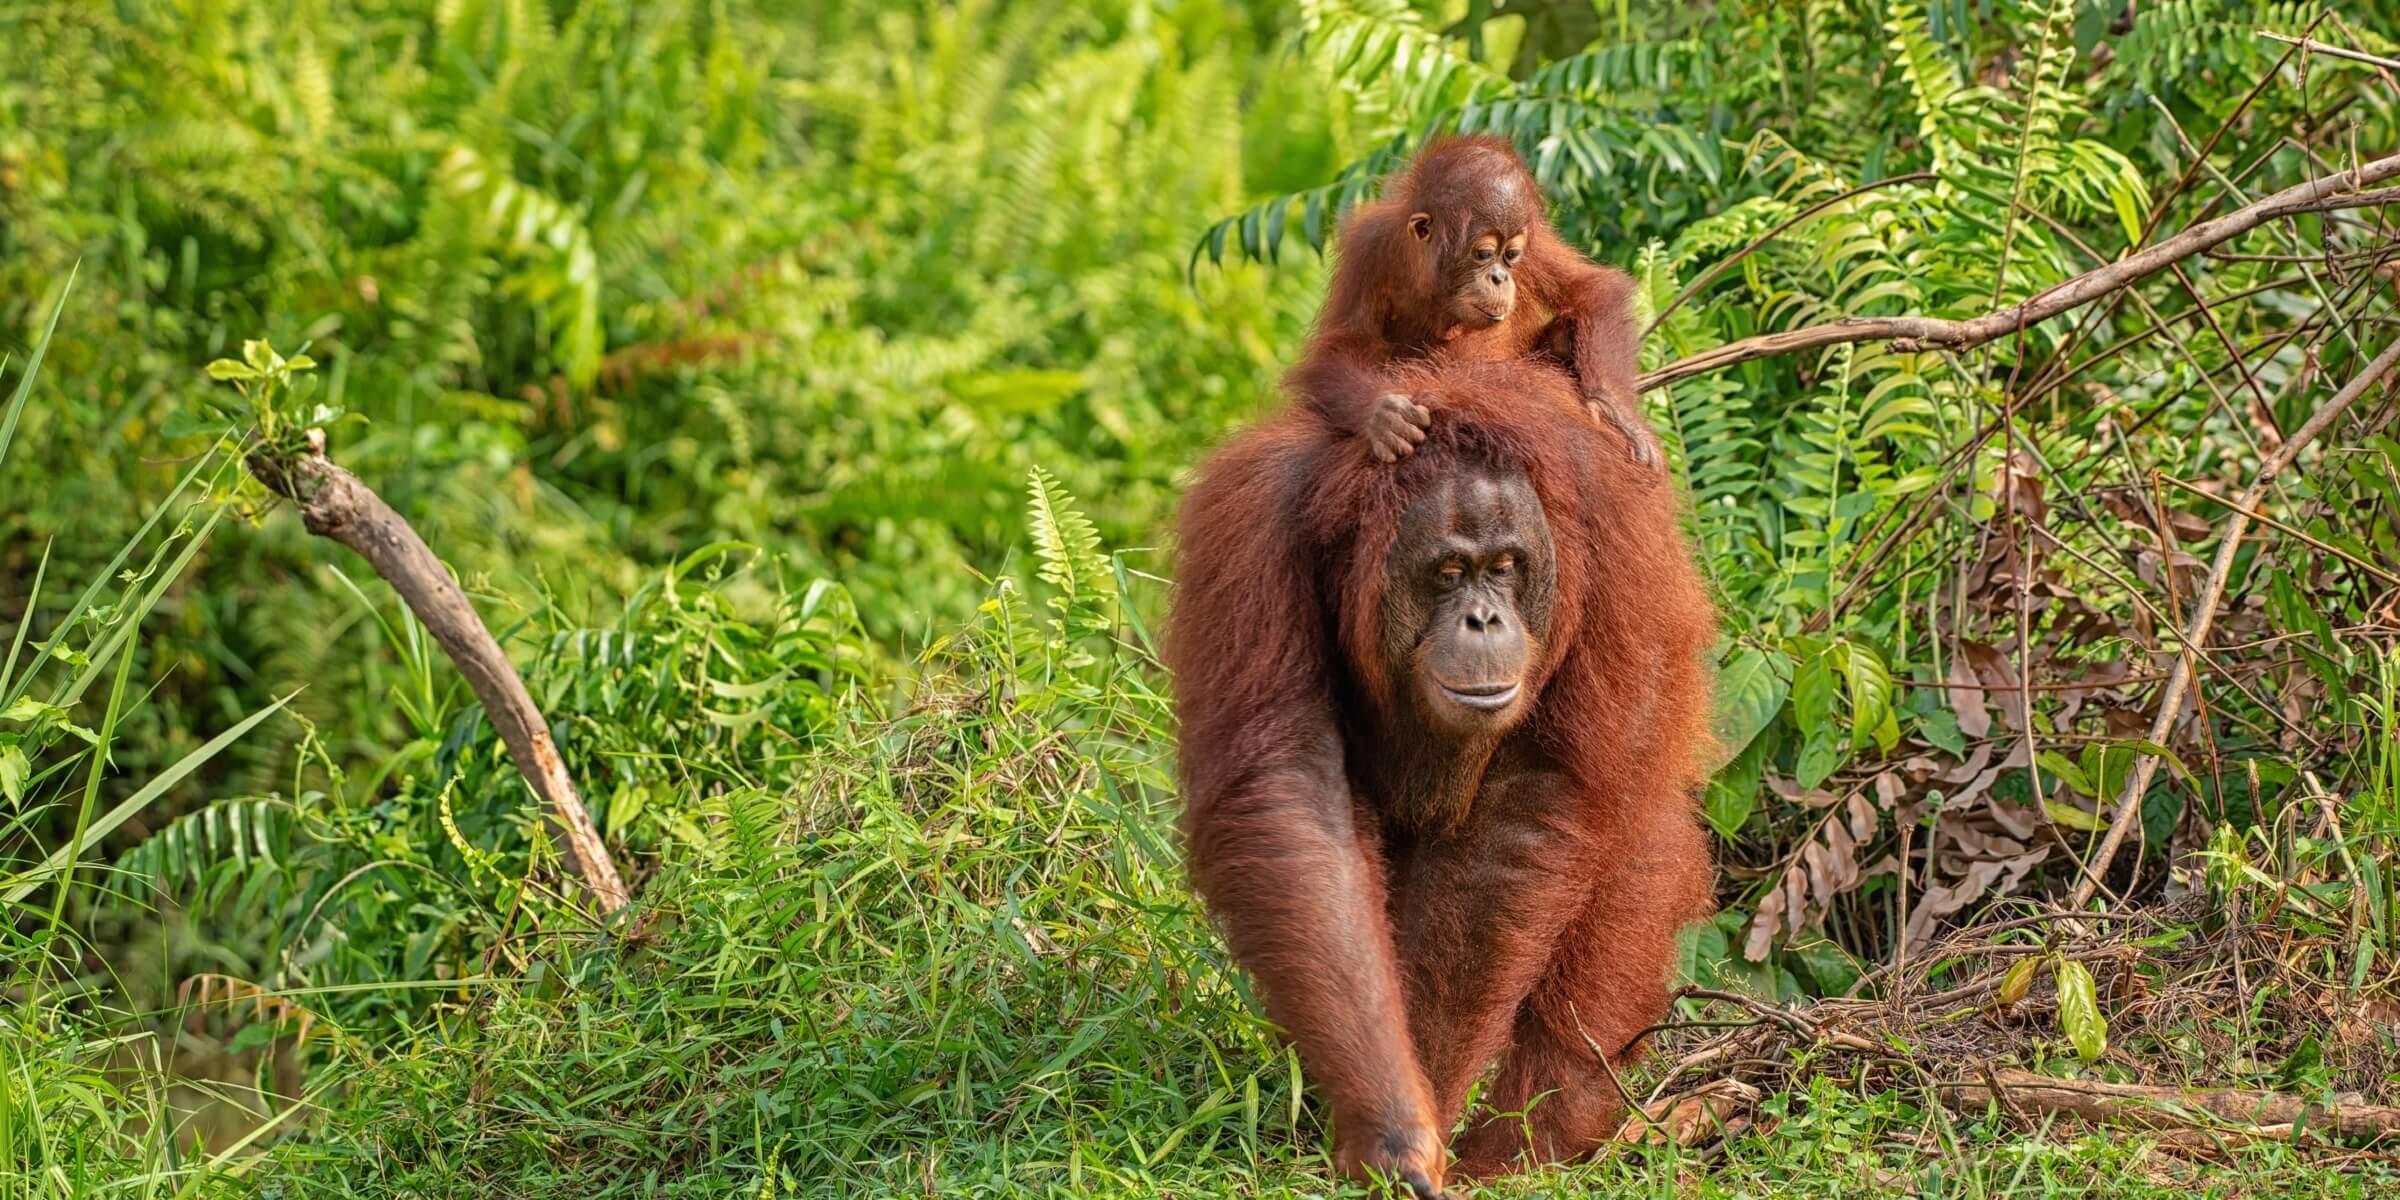 Orang Utans in freier Wildbahn in Malaysia